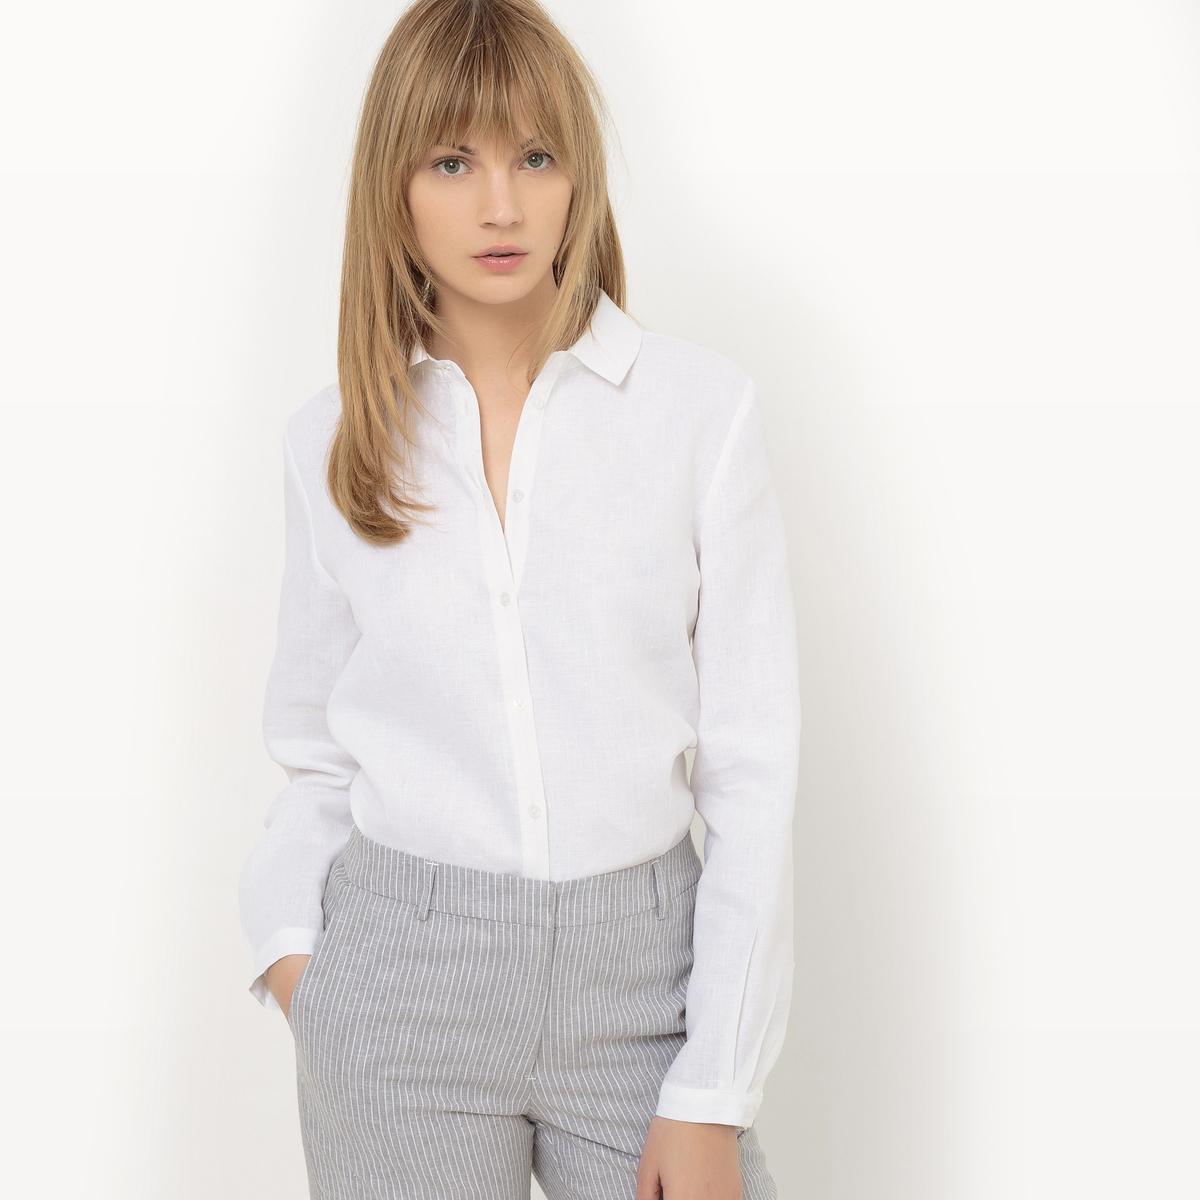 Camisa recta con lino